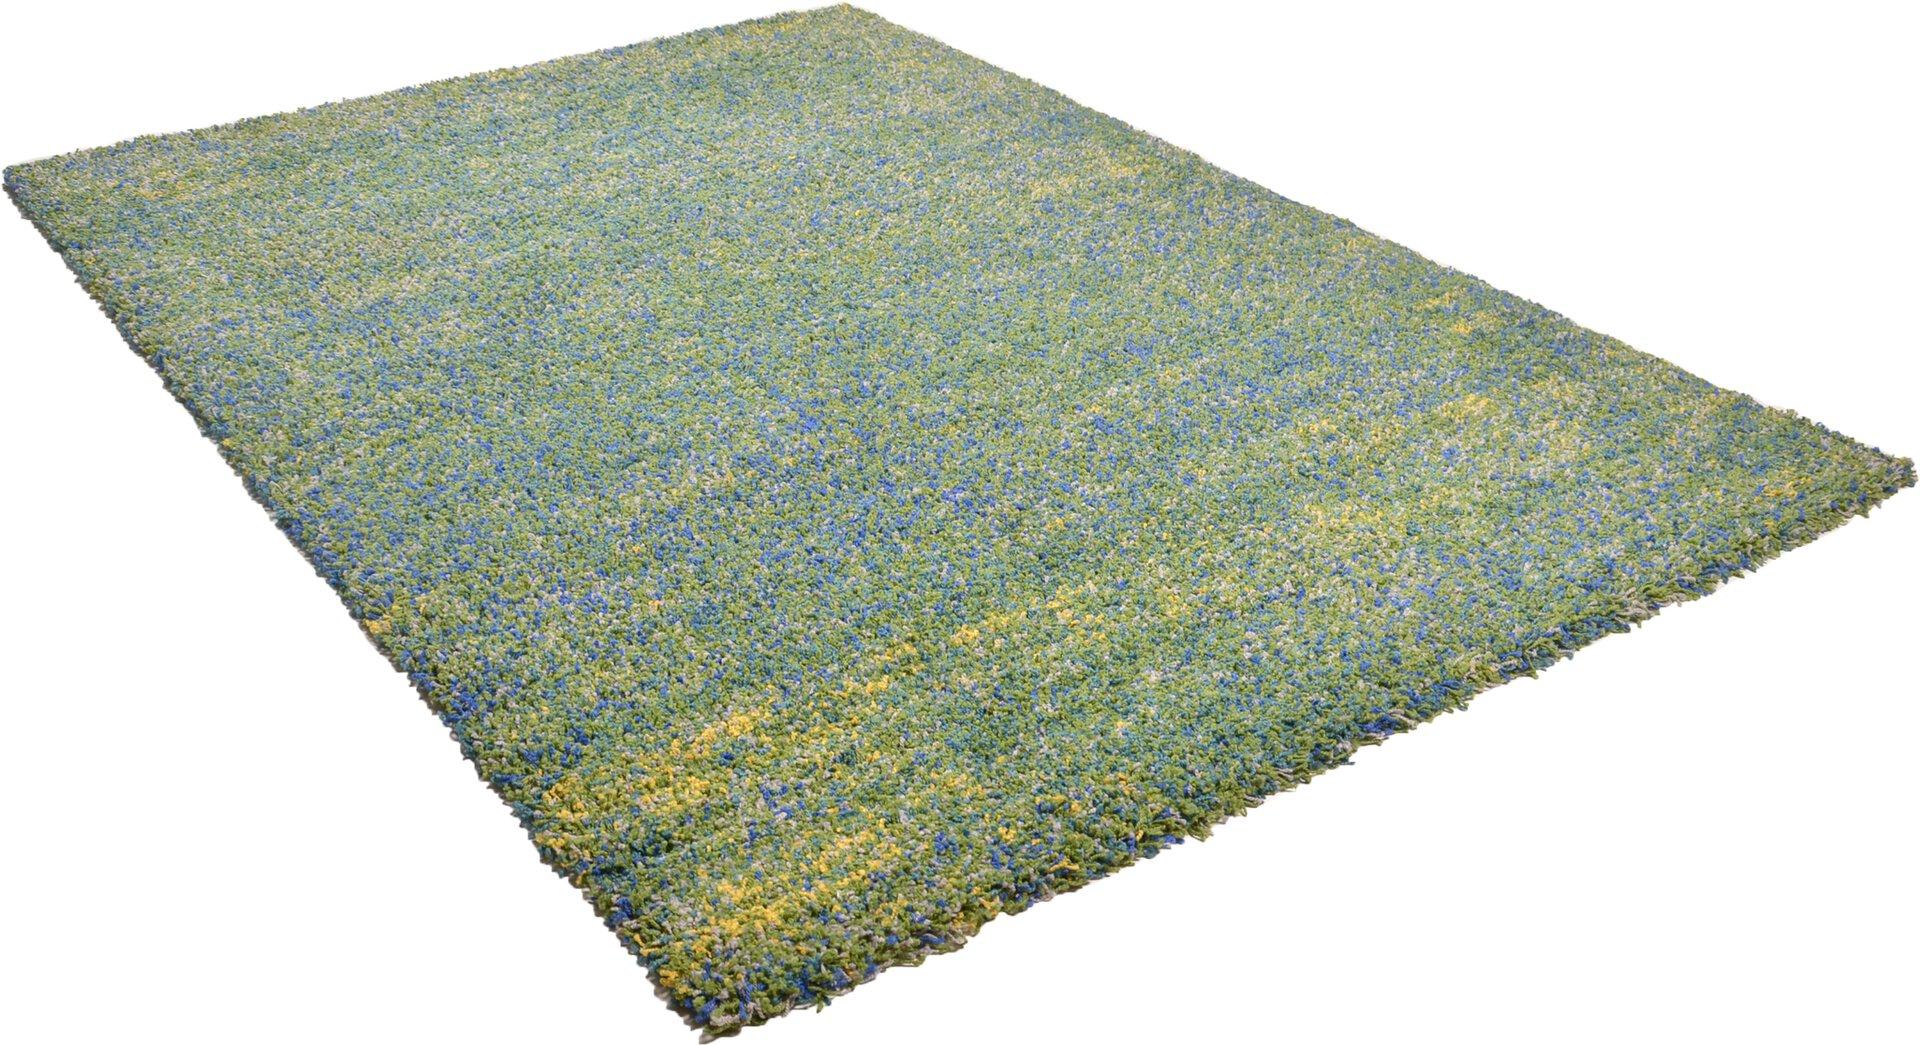 Maschinenwebteppich Color Shag Theko Textil grün